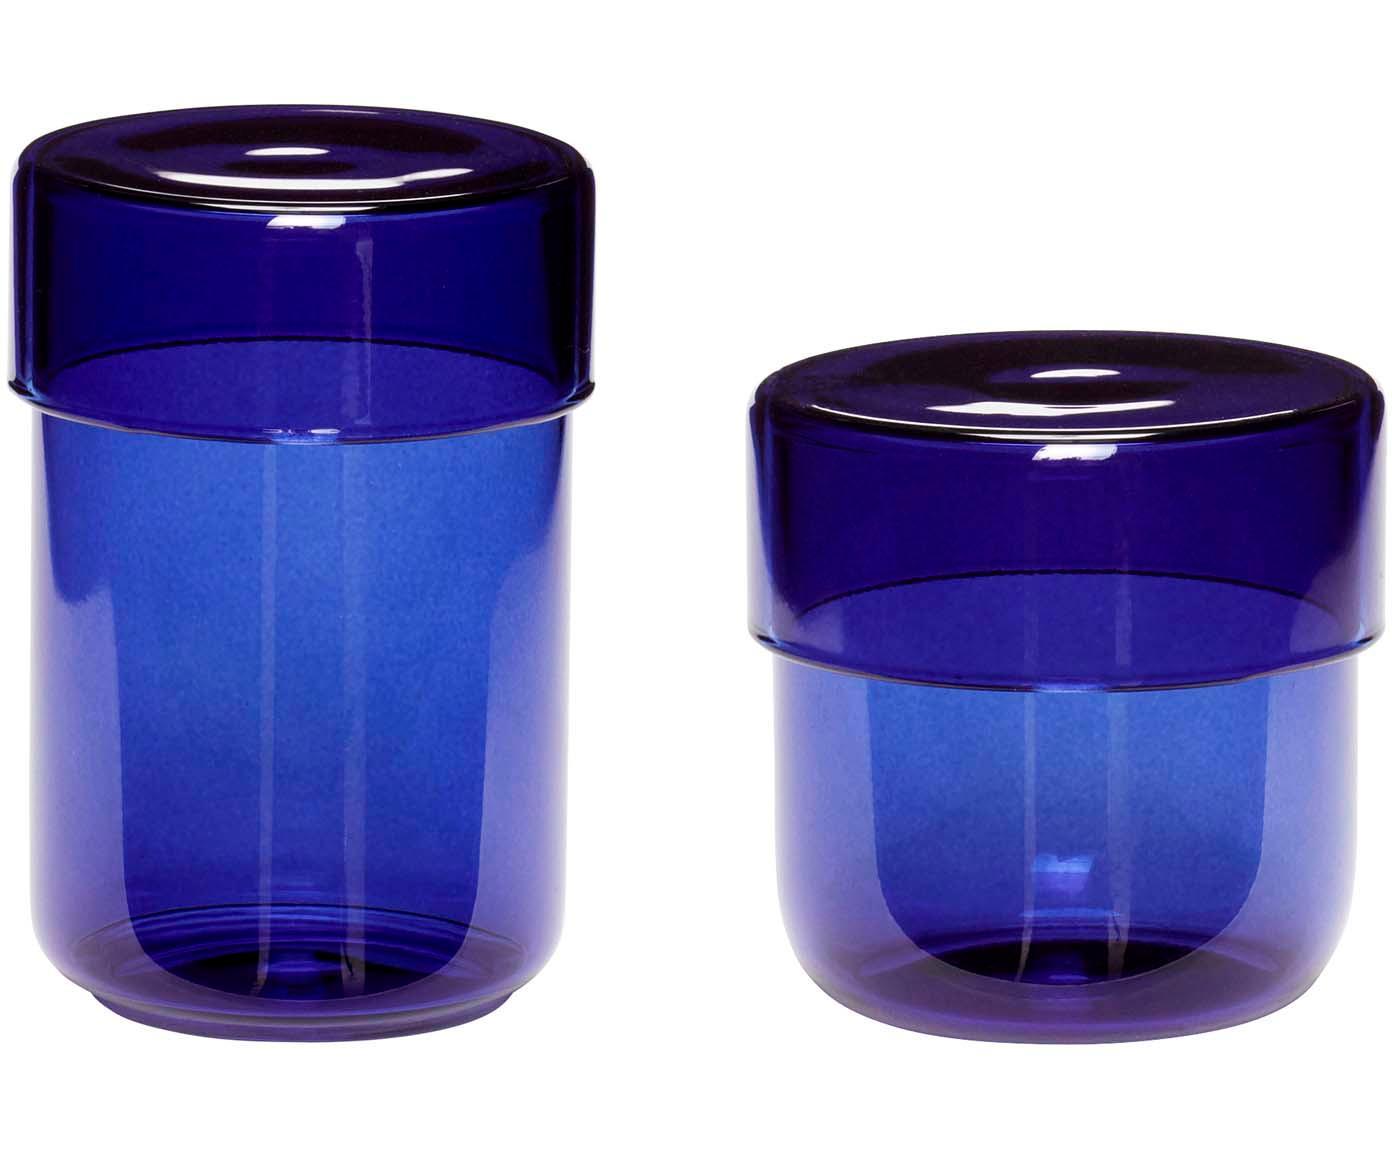 Opbergpottenset Transisto, 2-delig, Glas, Blauw, Pottenset M